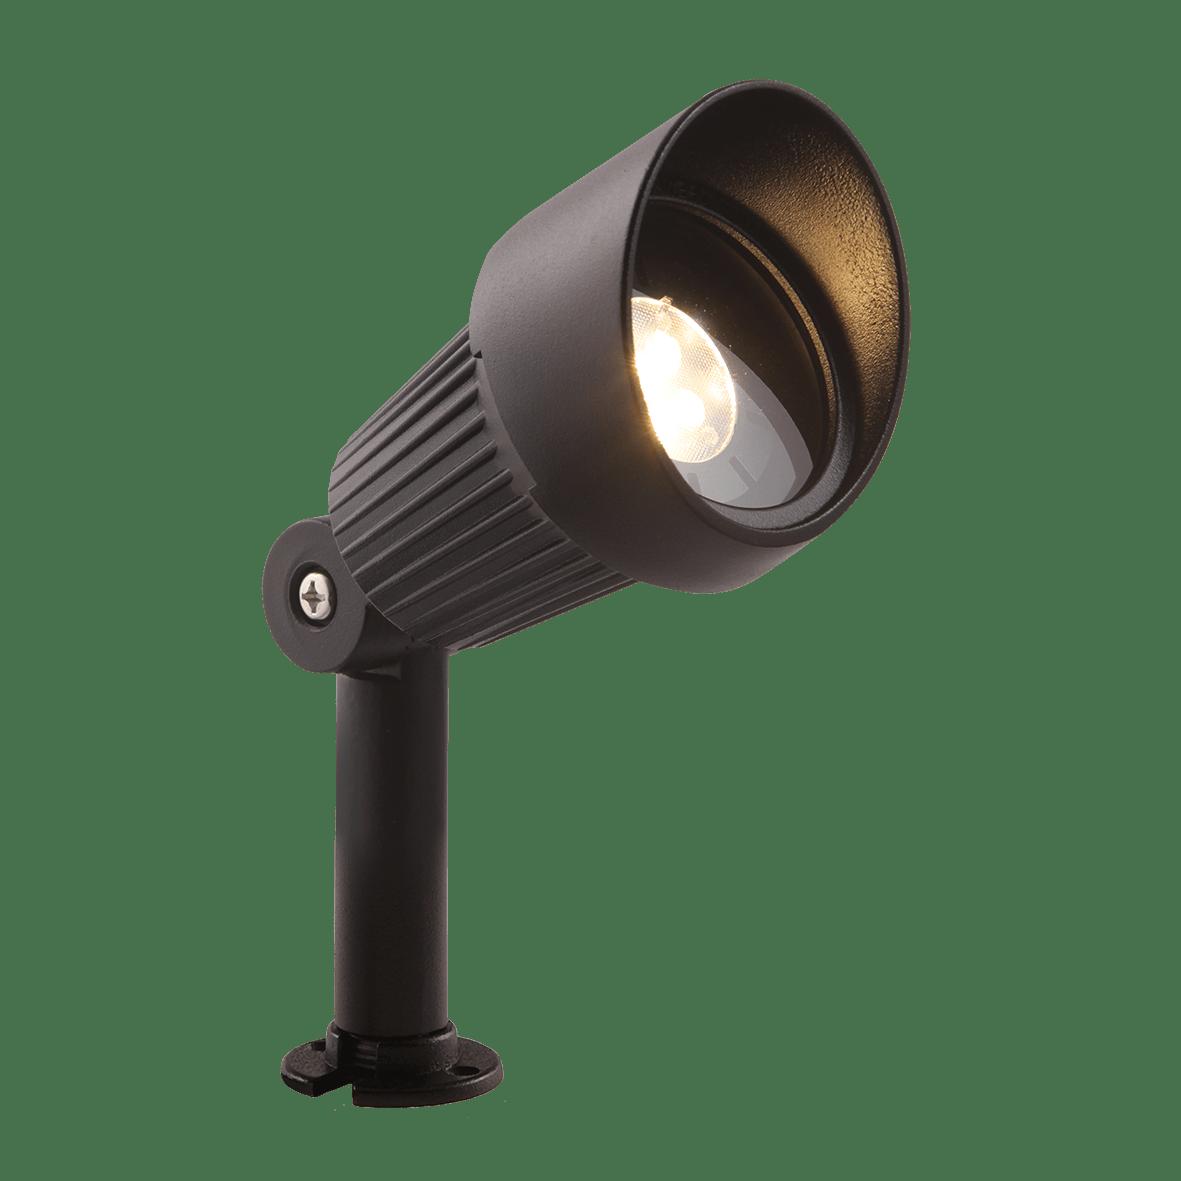 Garden Lights Tuinspot Focus LED | Tuinverlichting